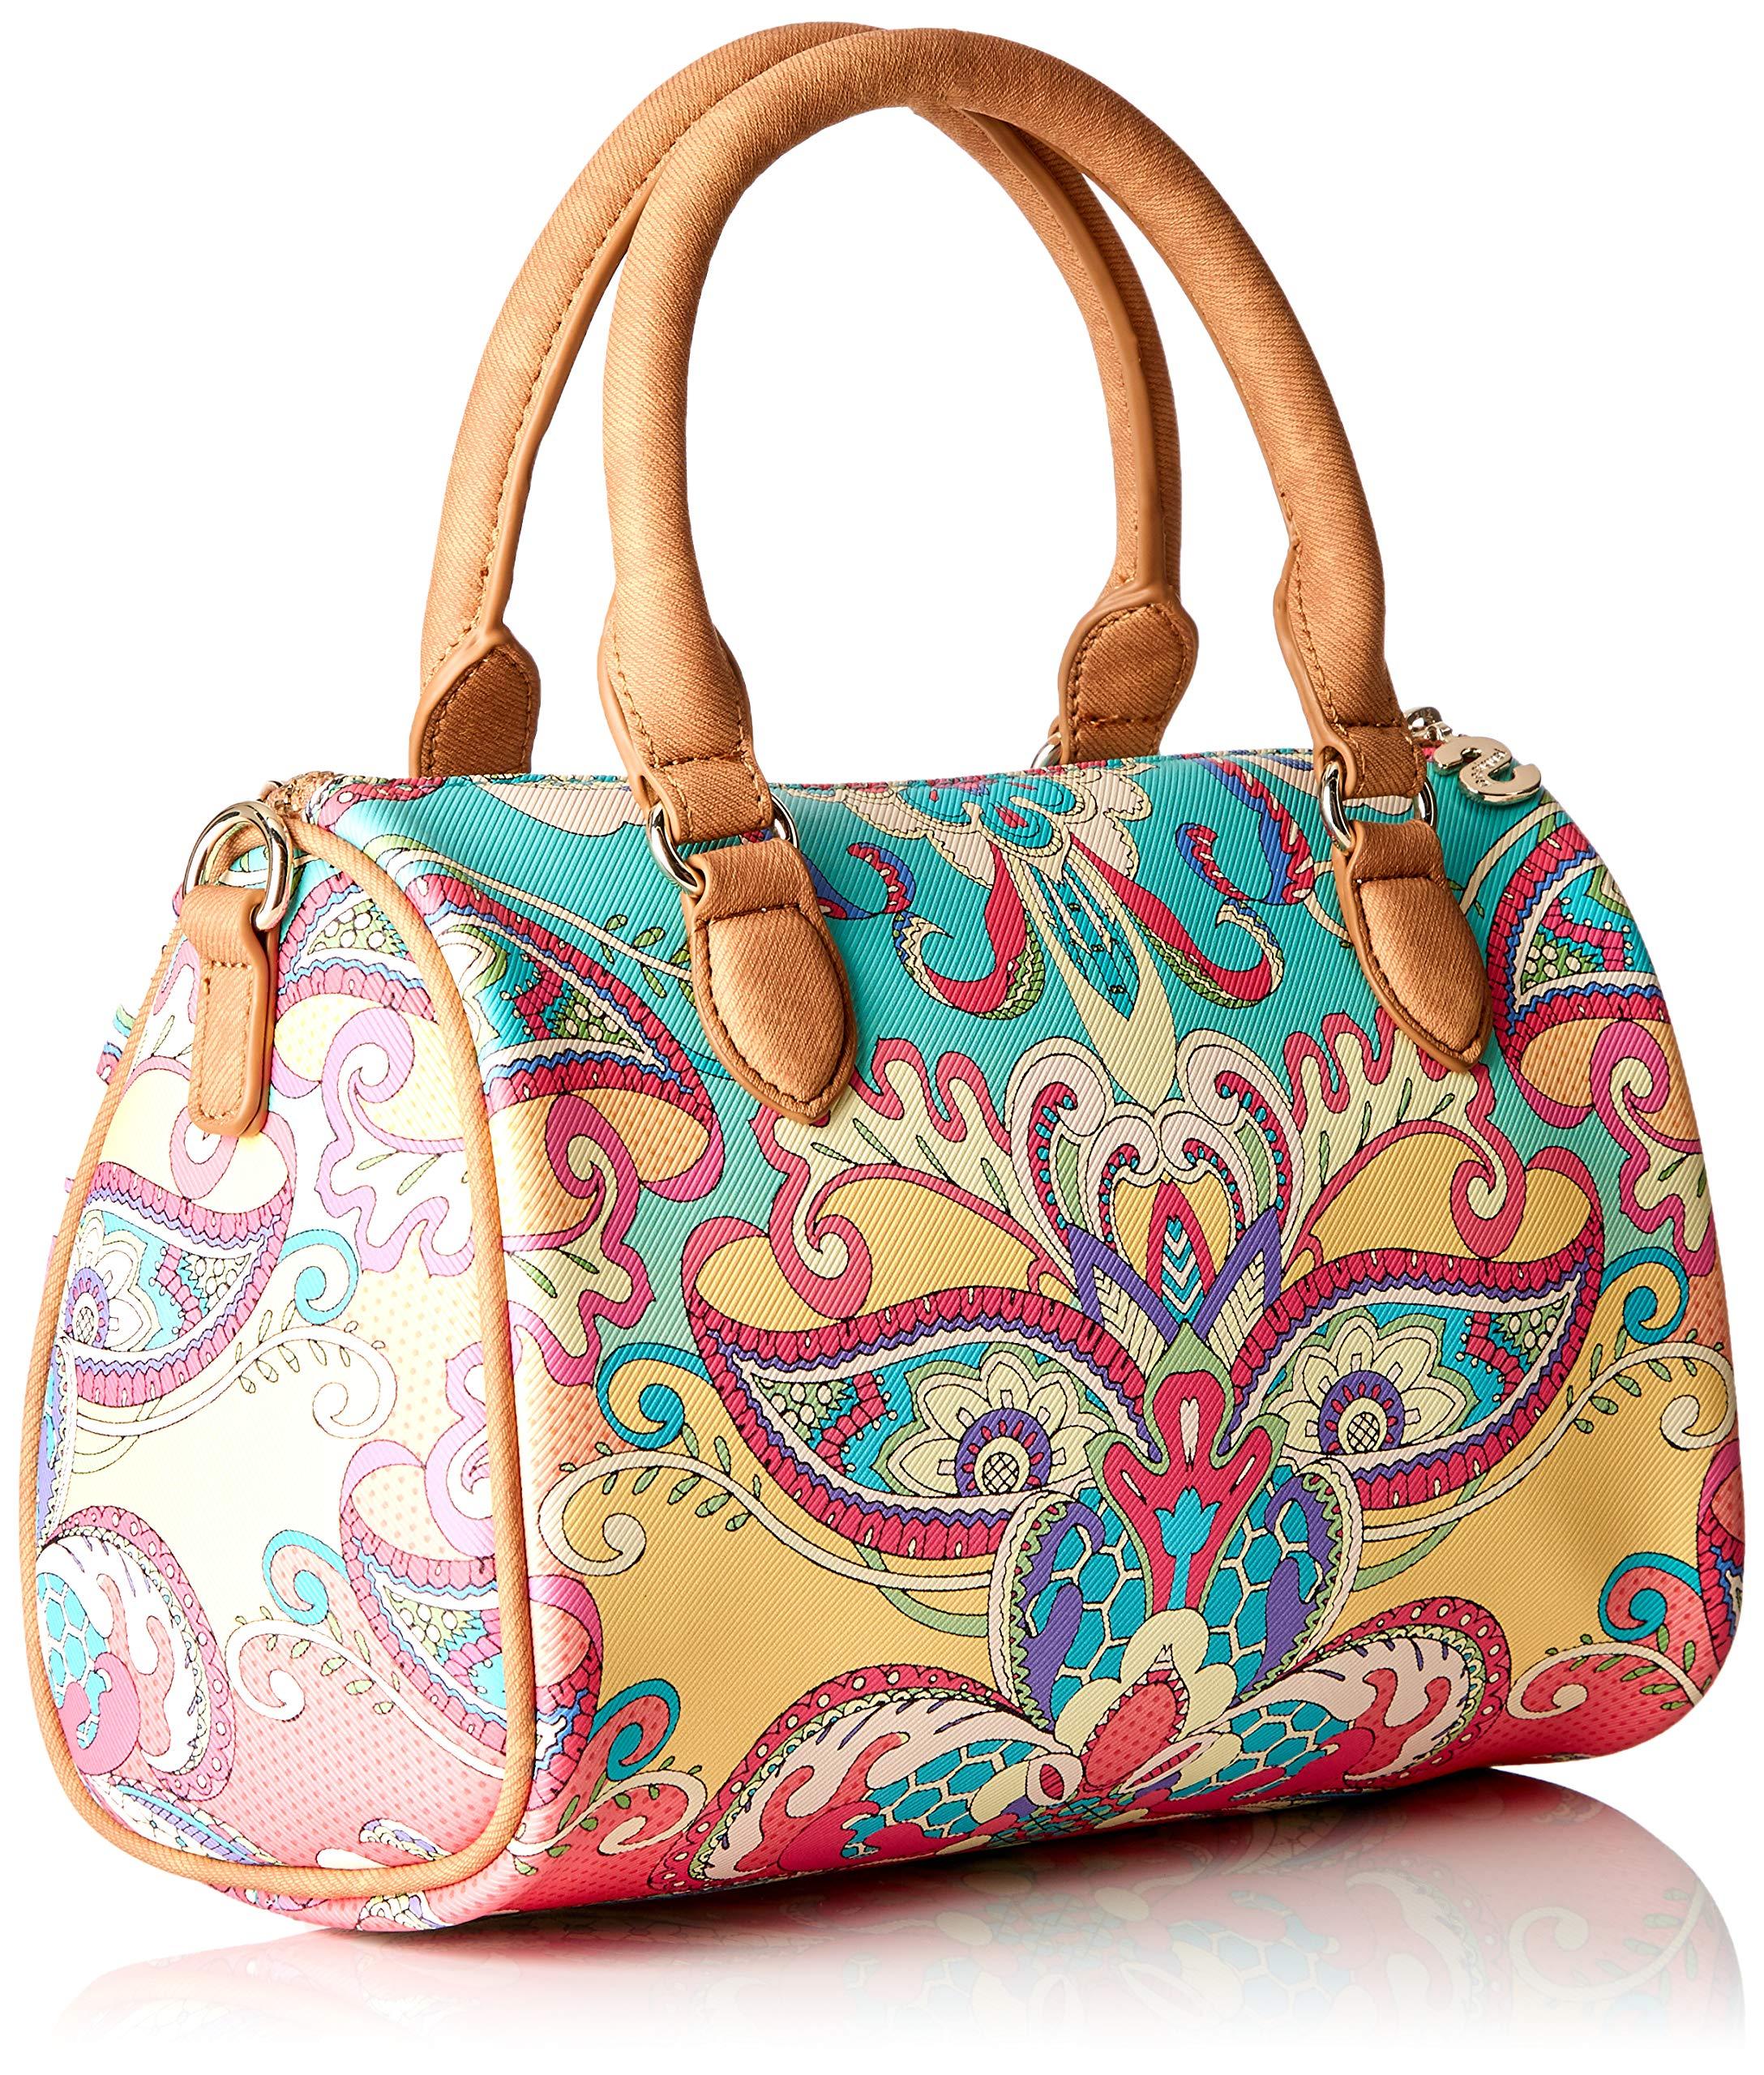 Desigual Bag Grand Valkiria Bowling Med Women - Borsette da polso Donna, Arancione (Coral), 13.7x18x27 cm (B x H T) 2 spesavip